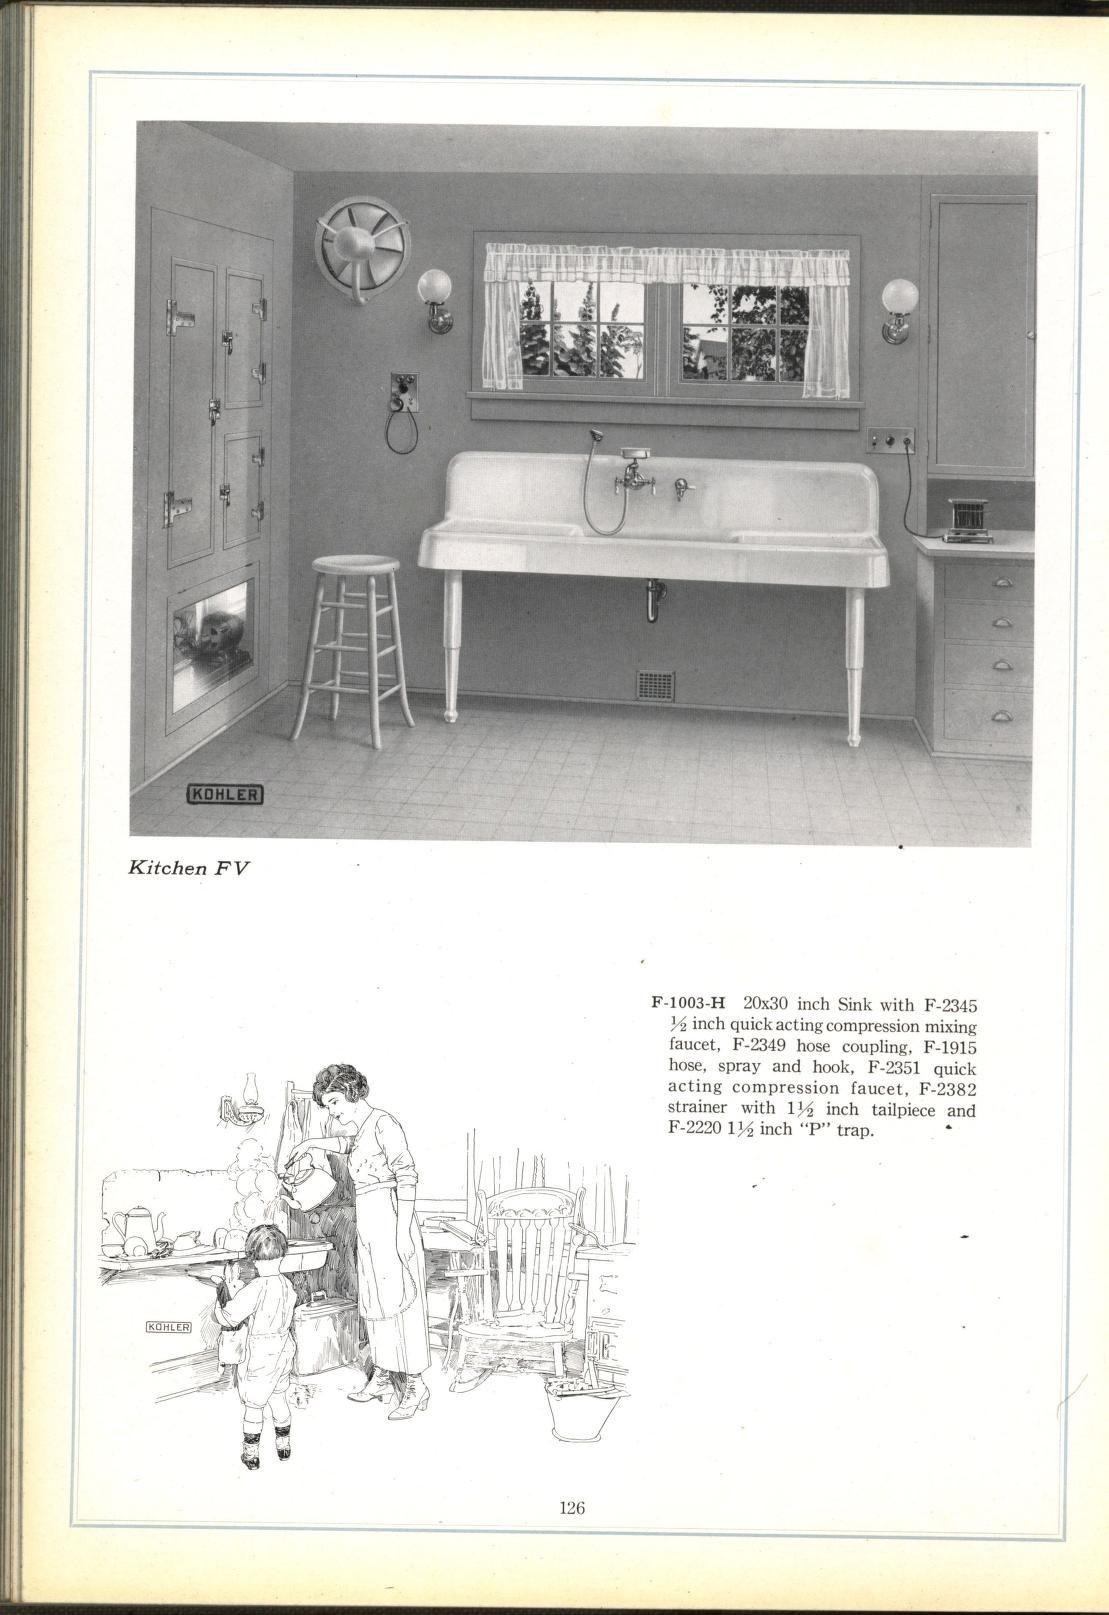 1pc Stainless Steel Mesh Sink Strainer Trap Bath Hair Drain Hole